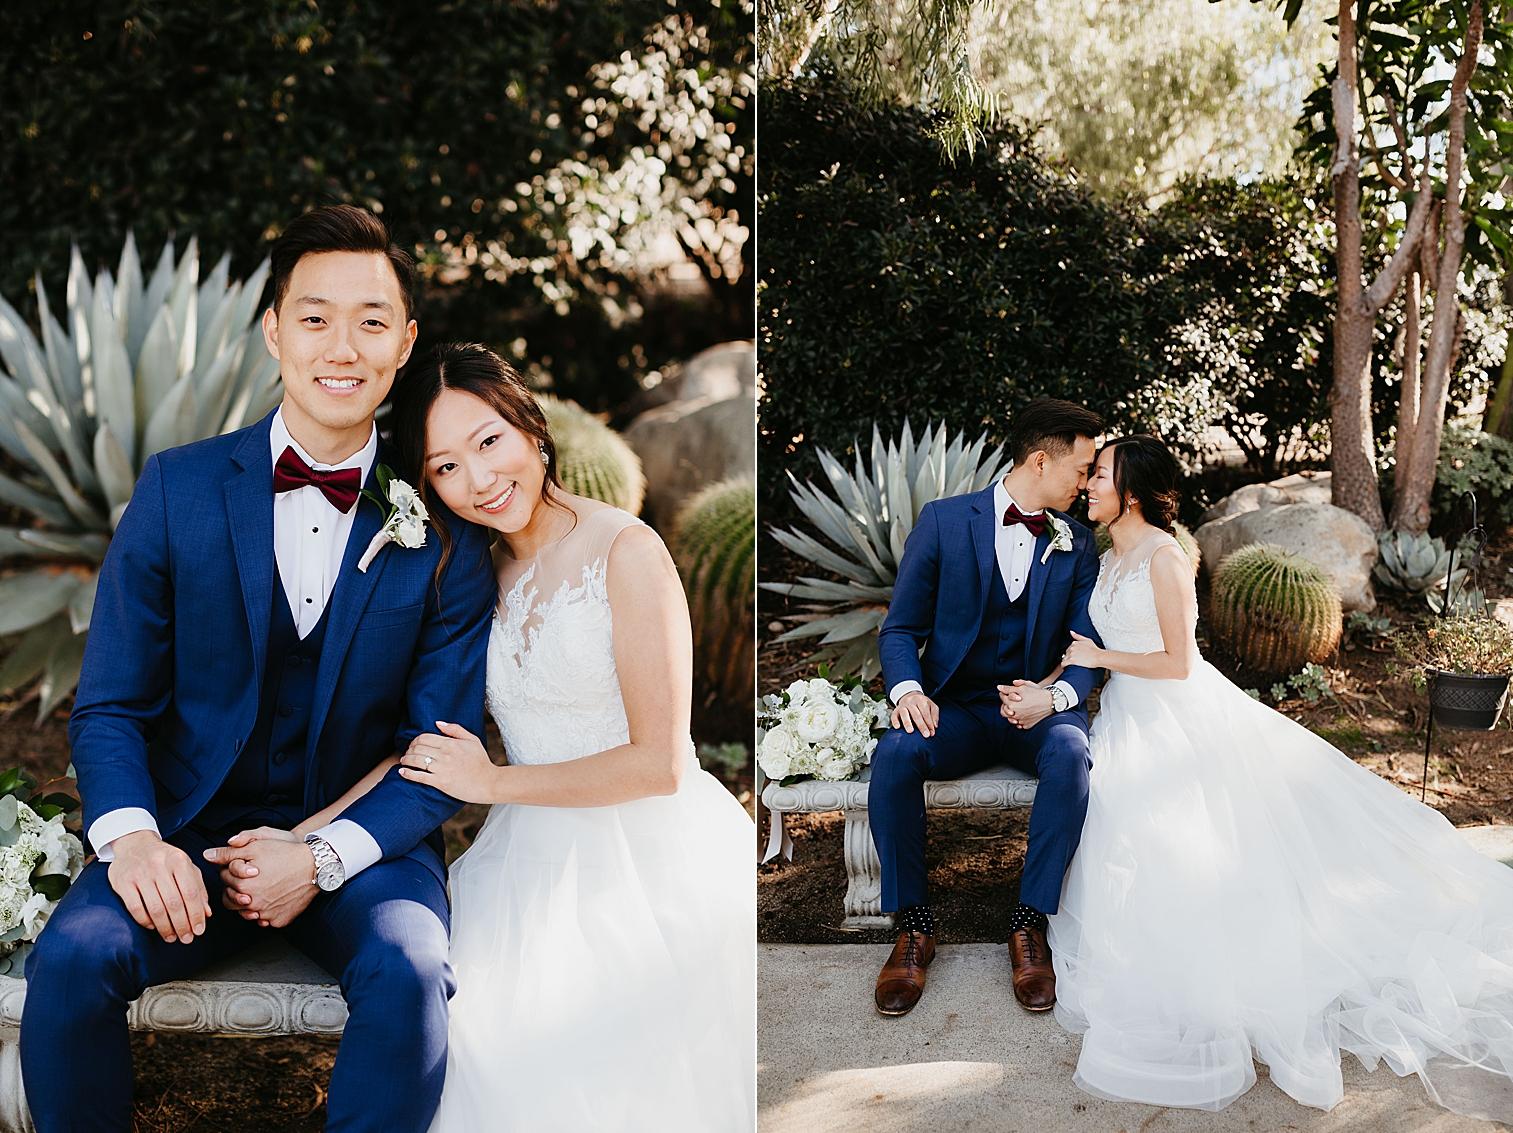 Secret-Garden-Rancho-Santa-Fe-Wedding-42.jpg